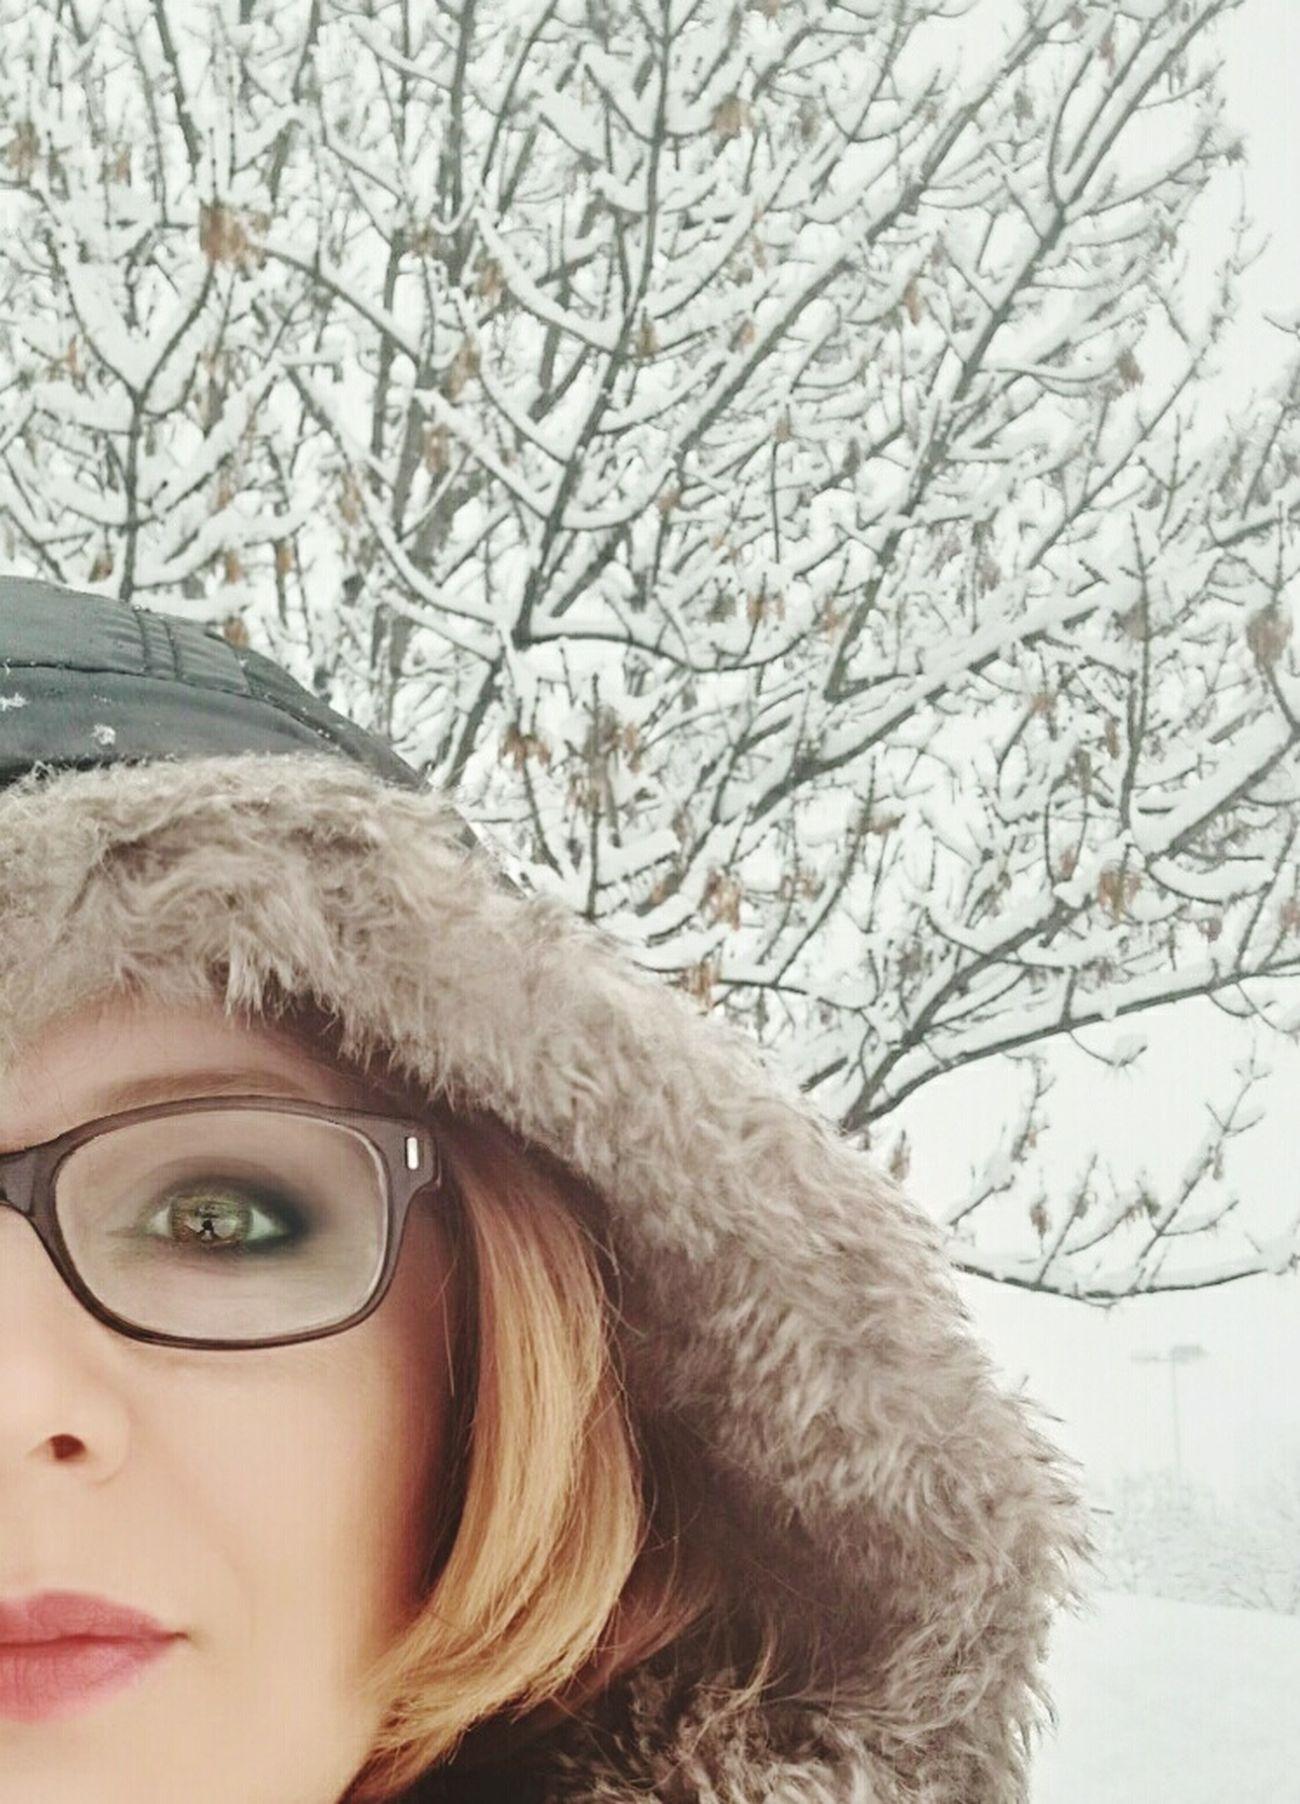 Snow ❄ Snowy Trees